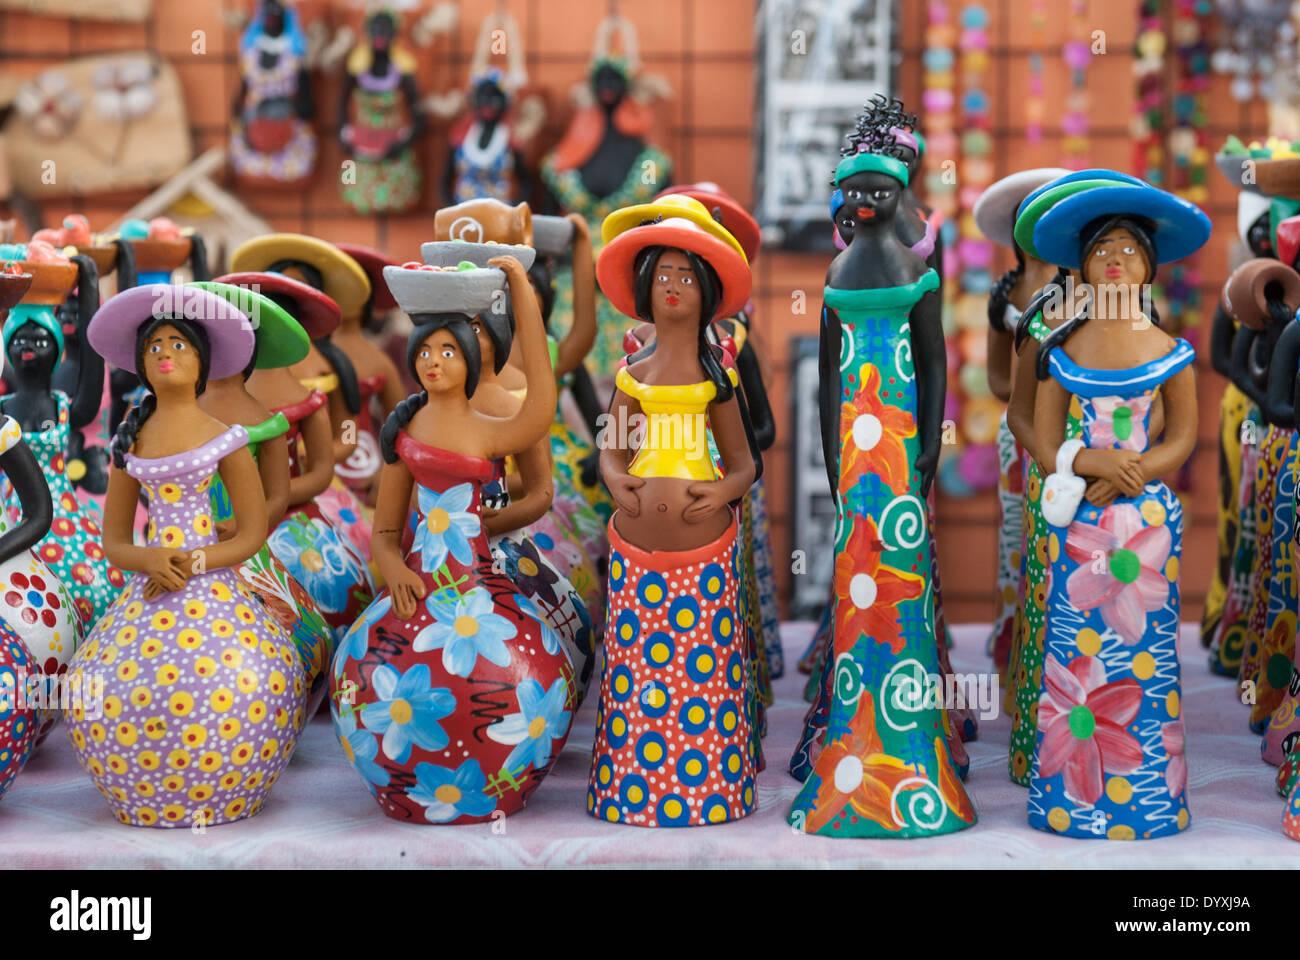 Armario Quarto Madeira Maciça ~ Olinda, Pernambuco State, Brazil Tourist souvenir colourful Stock Photo, Royalty Free Image